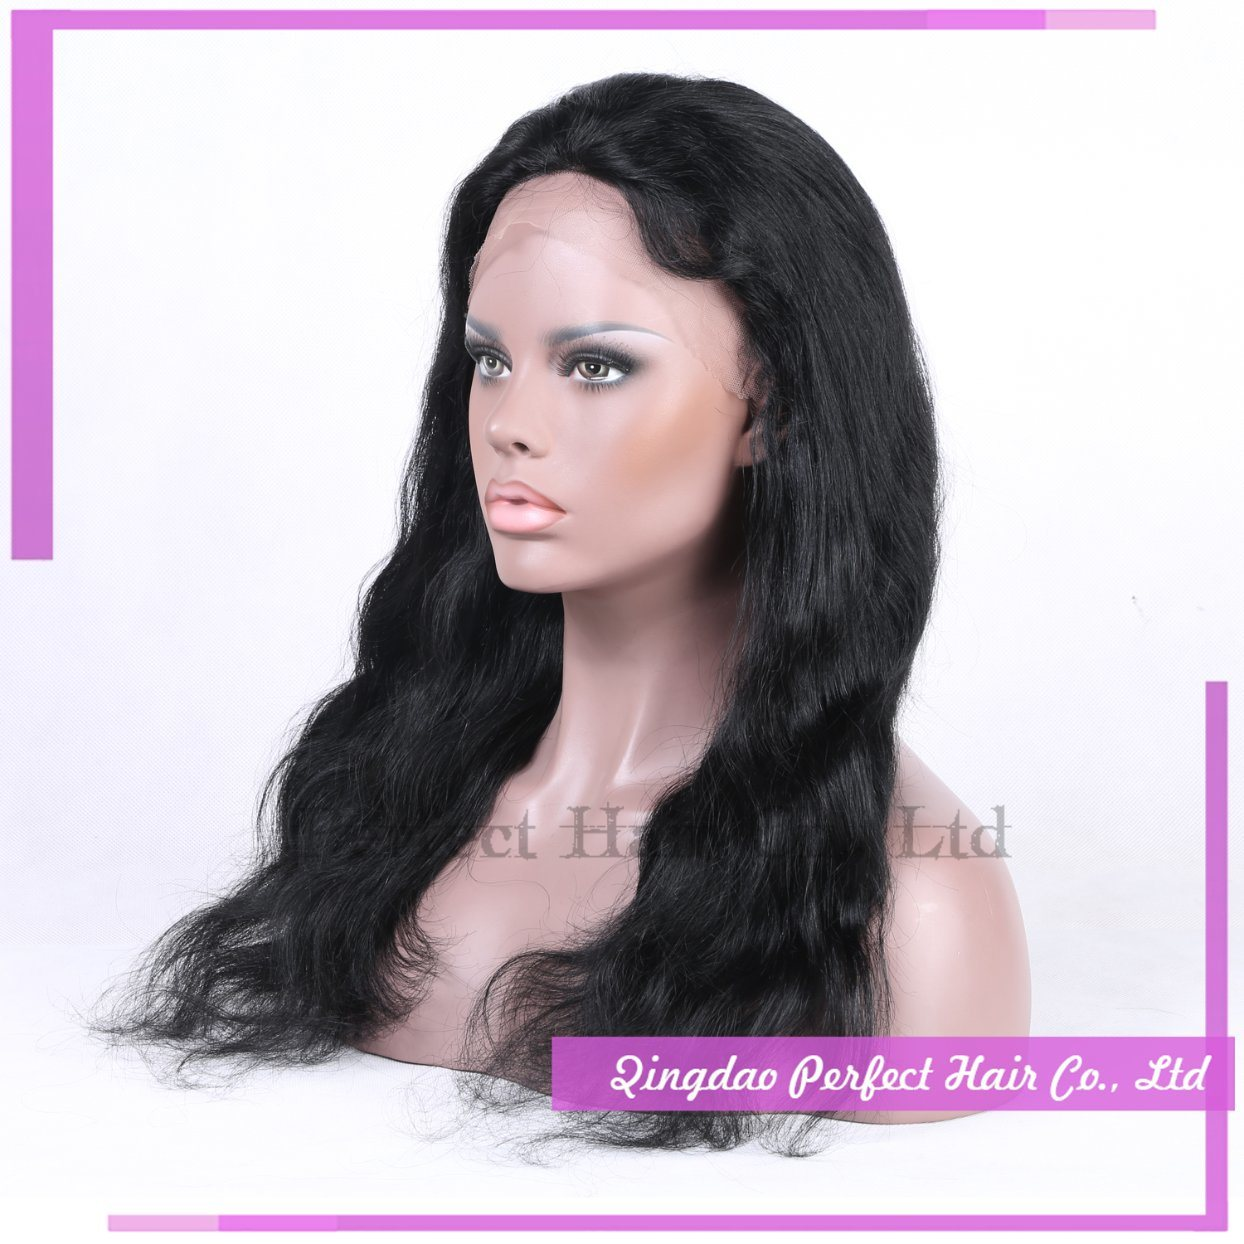 China Indian Women Hair Wig Indian Women Hair Wig Manufacturers